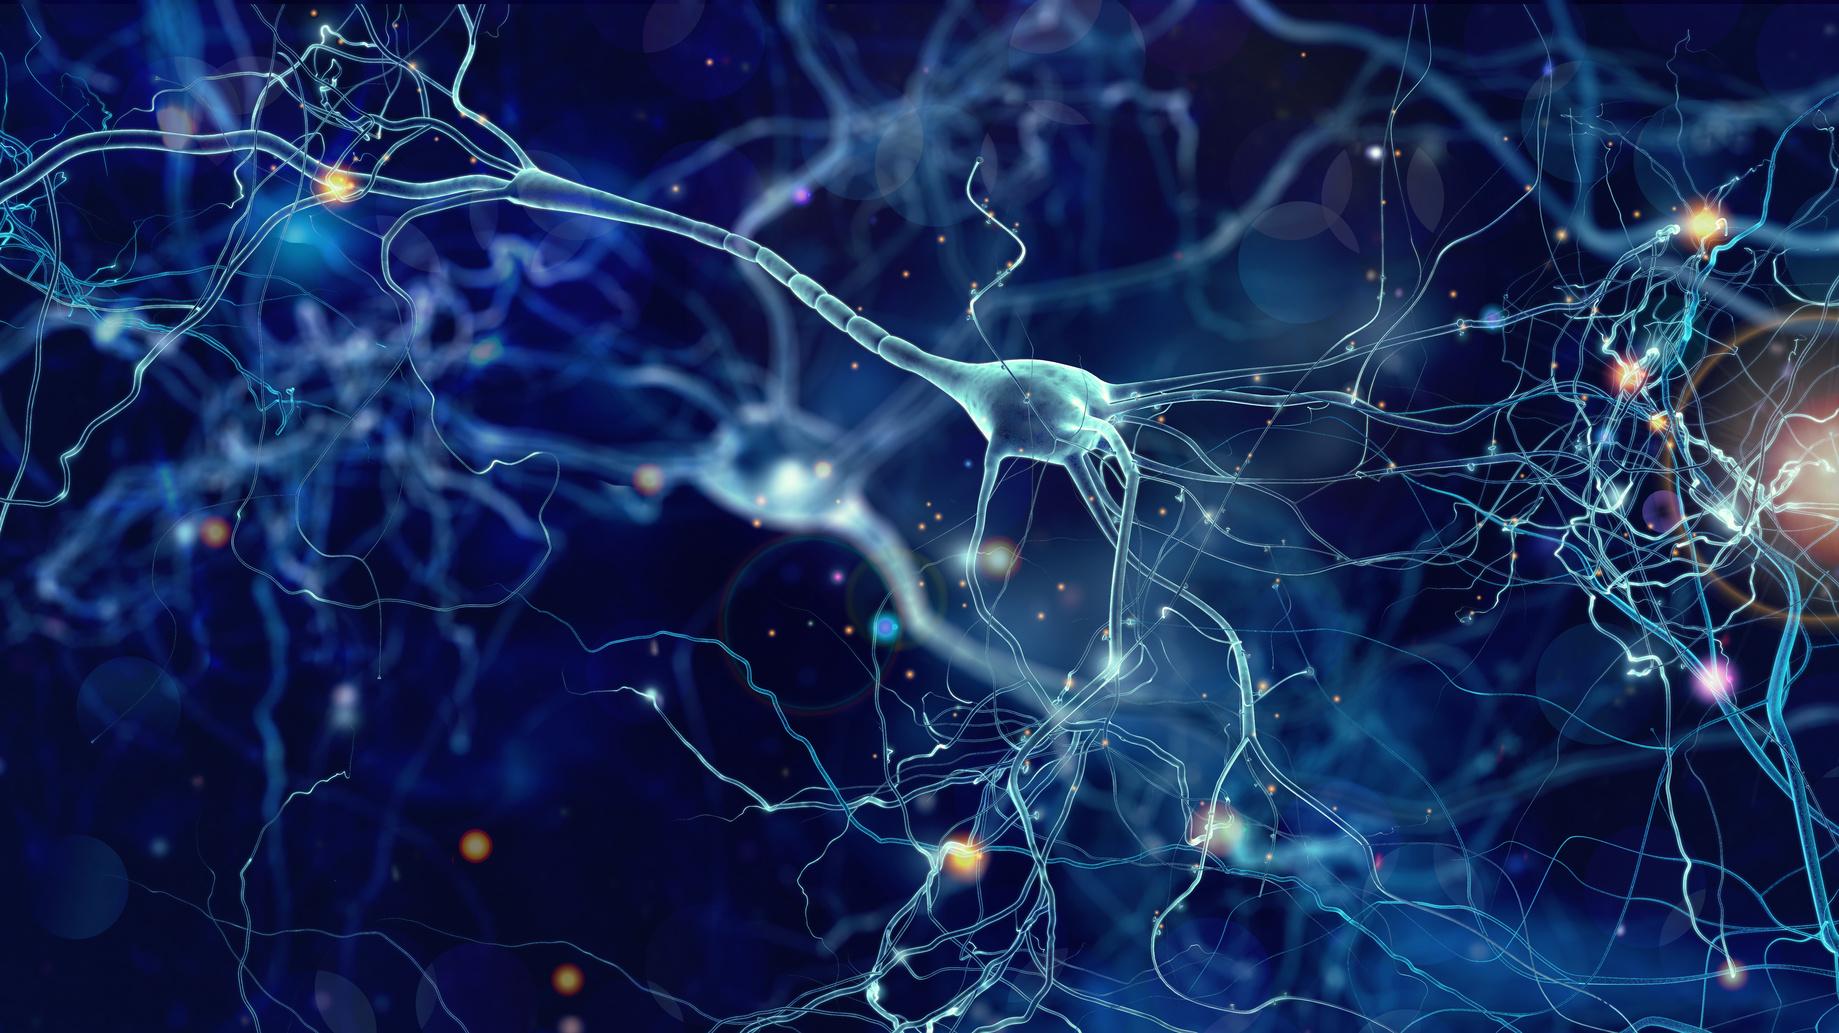 A Walk Through Our Nervous System